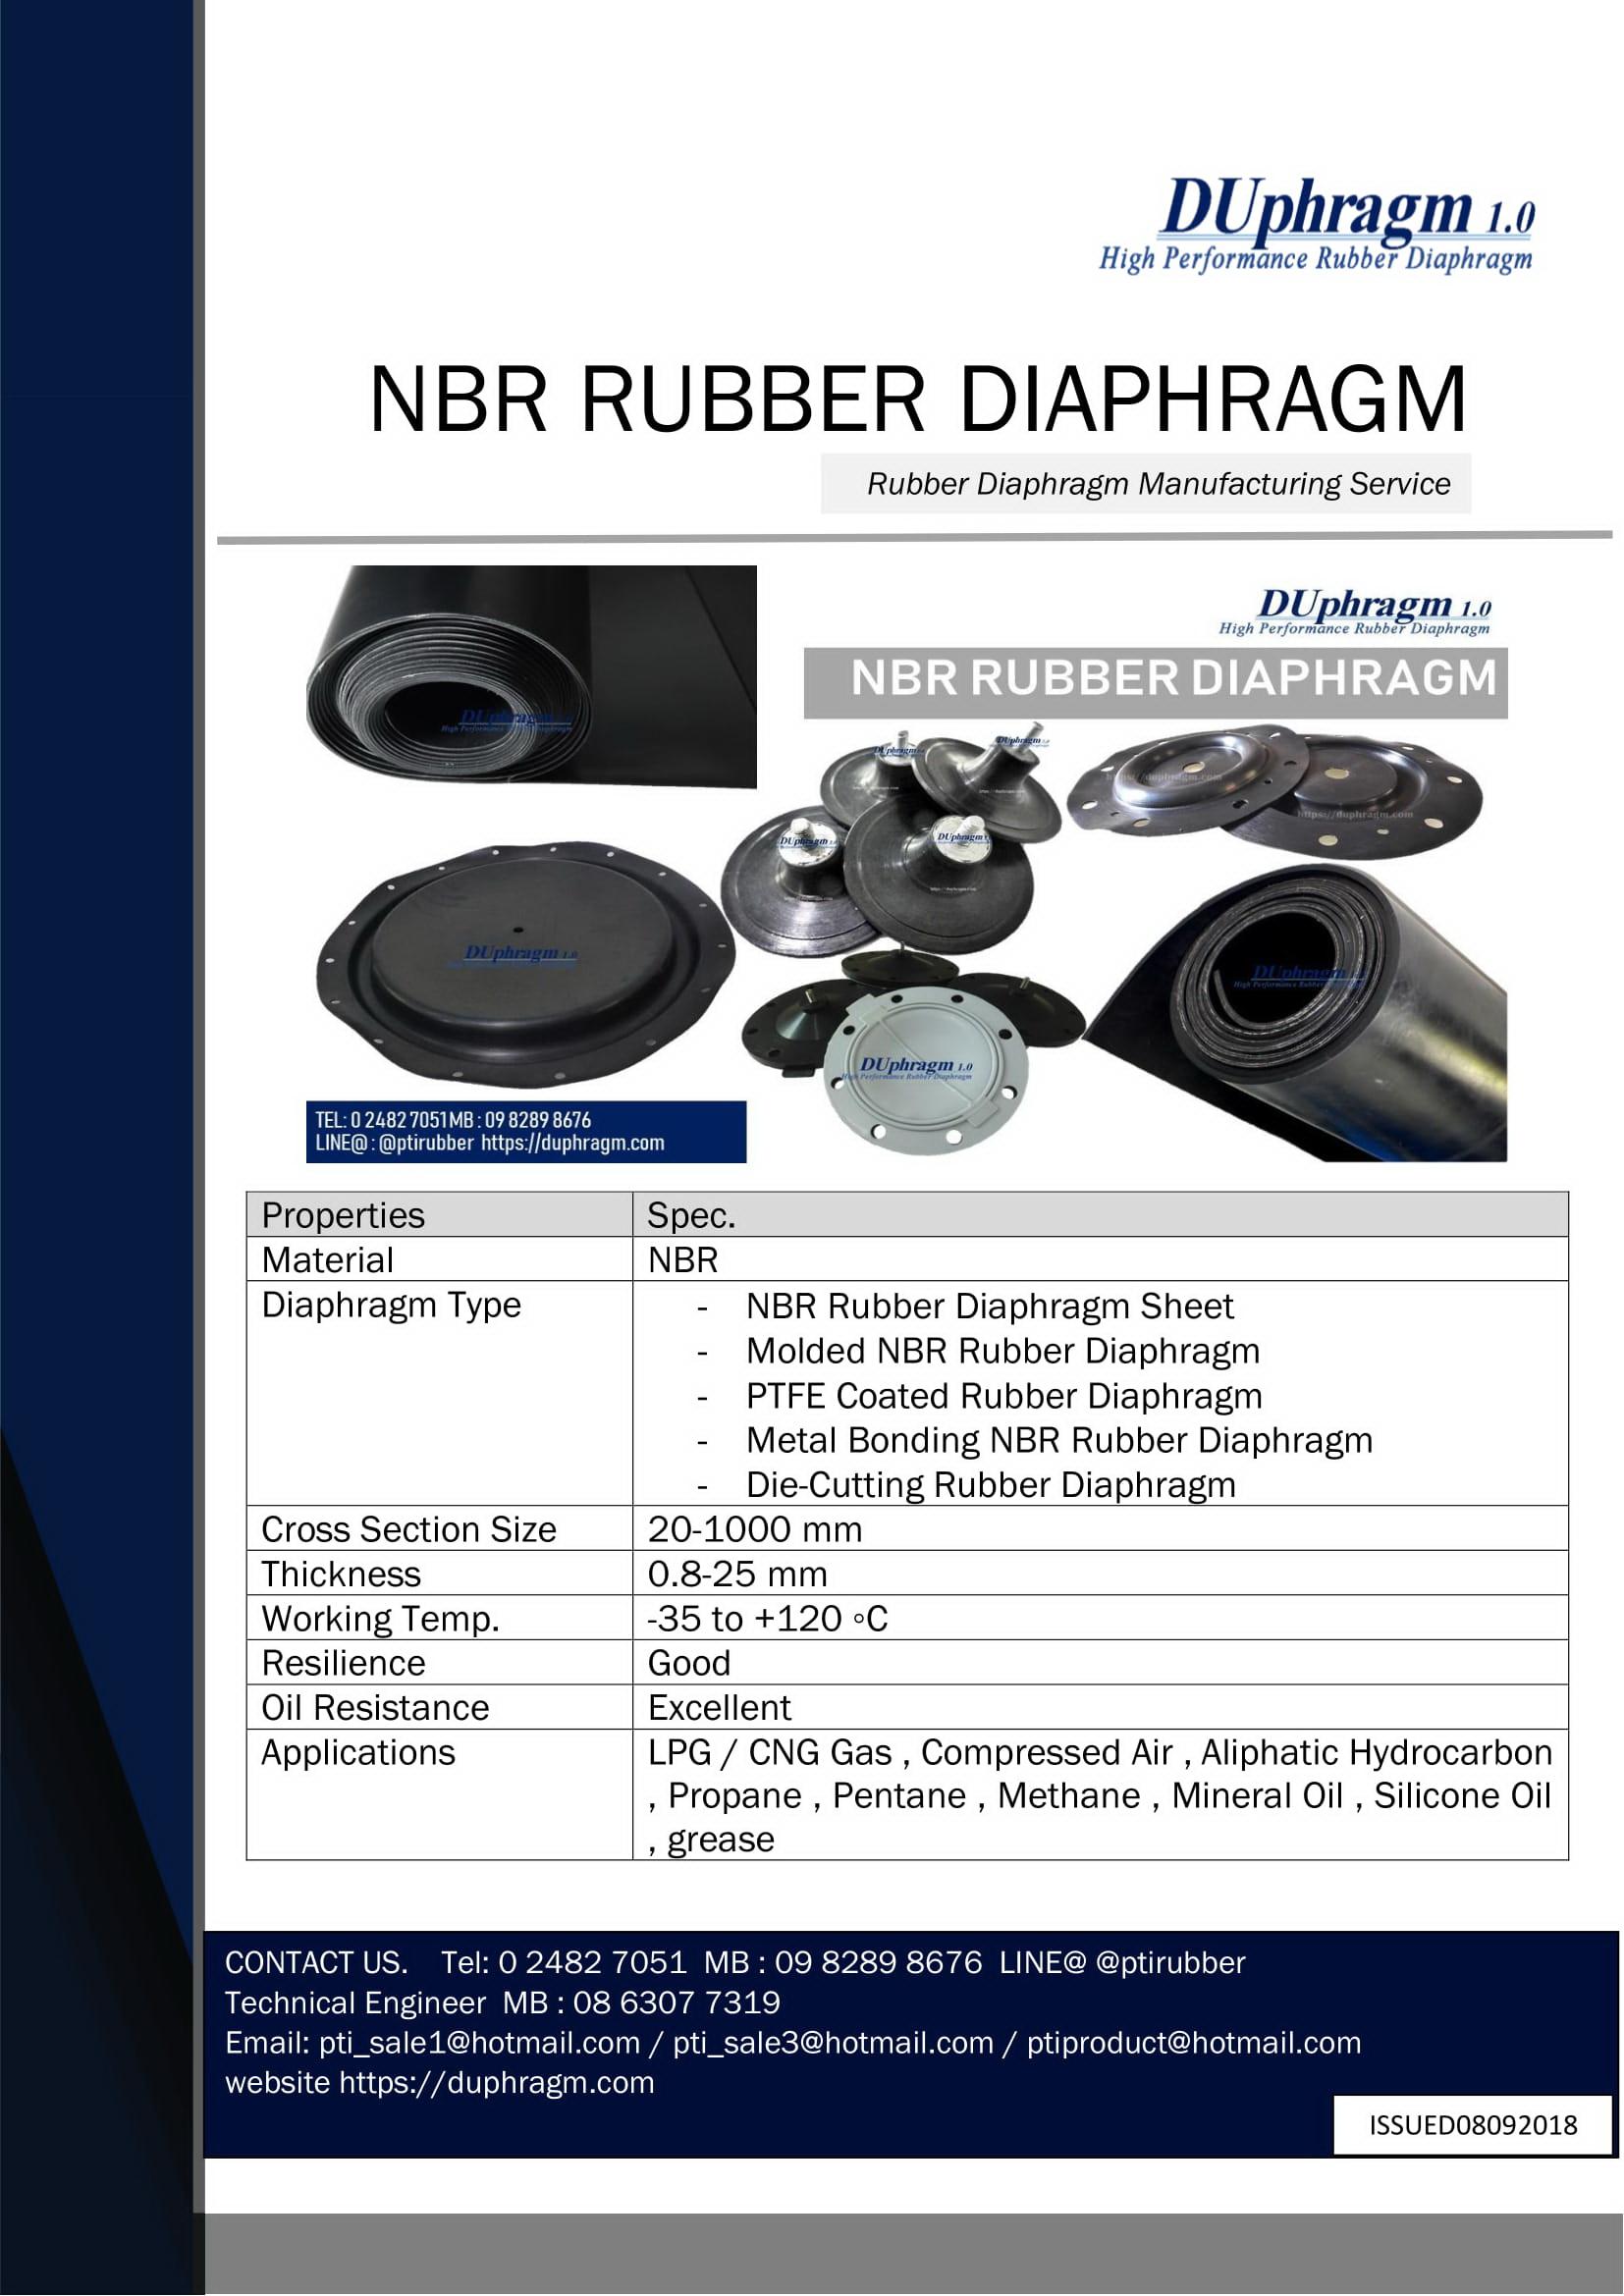 NBR Rubber Diaphragm Manufacturing Service-1.jpg